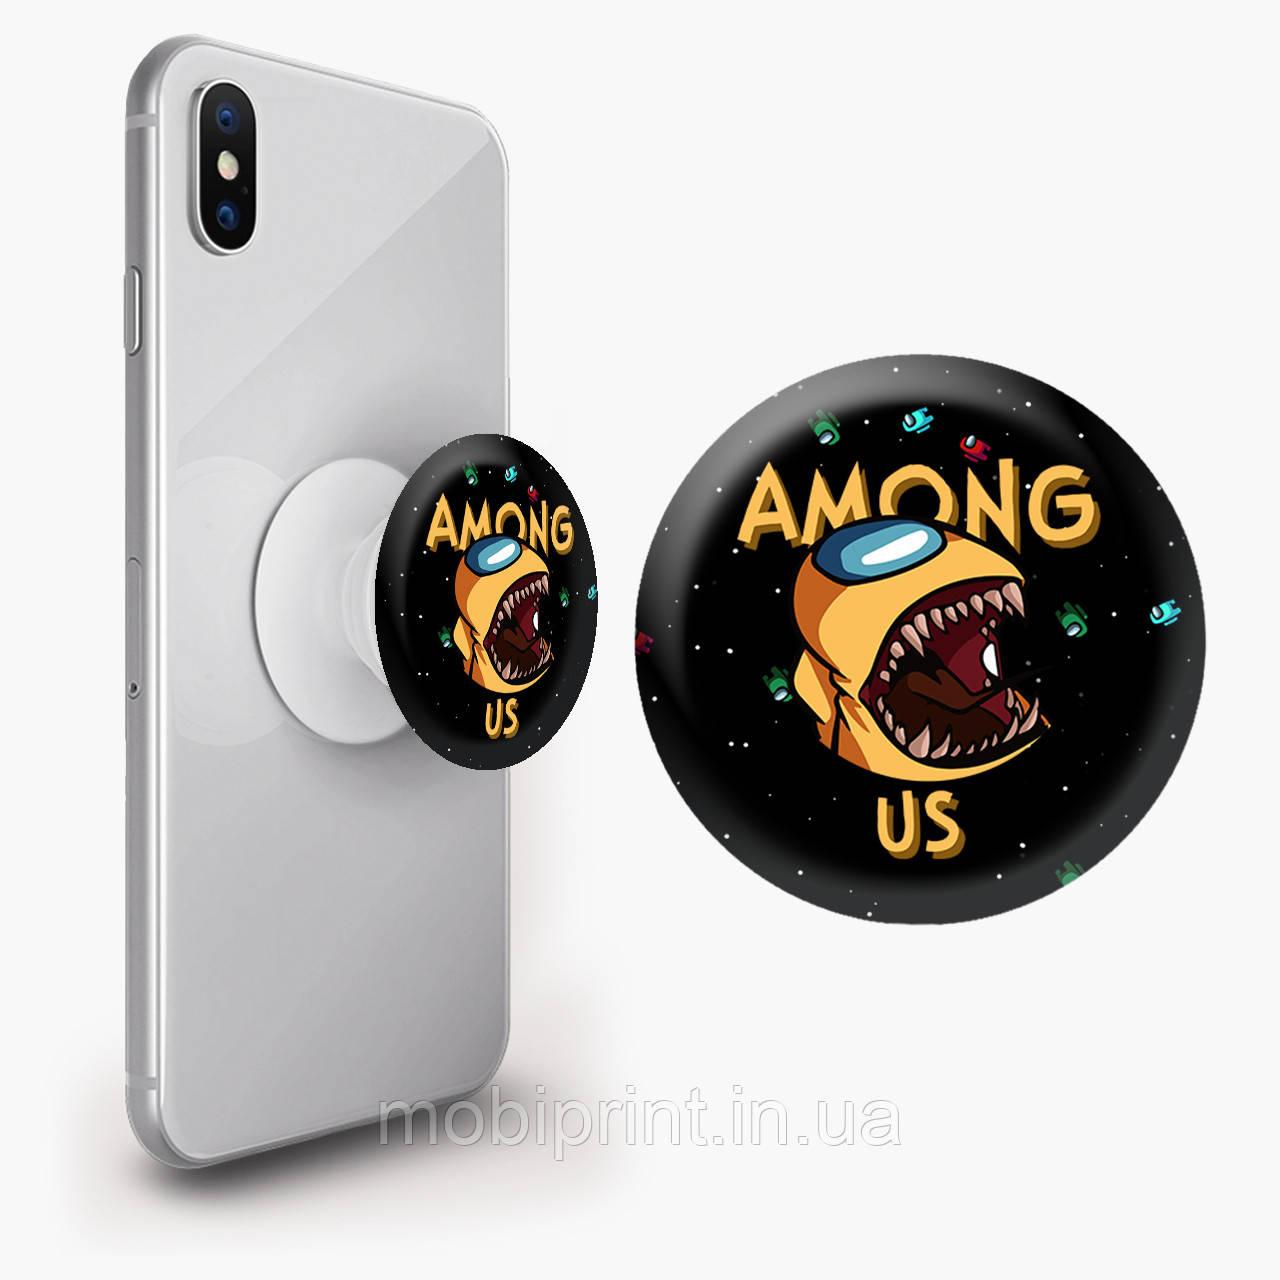 Попсокет (Popsockets) тримач для смартфона Амонг Ас Жовтий (Among Us Yellow) (8754-2409)